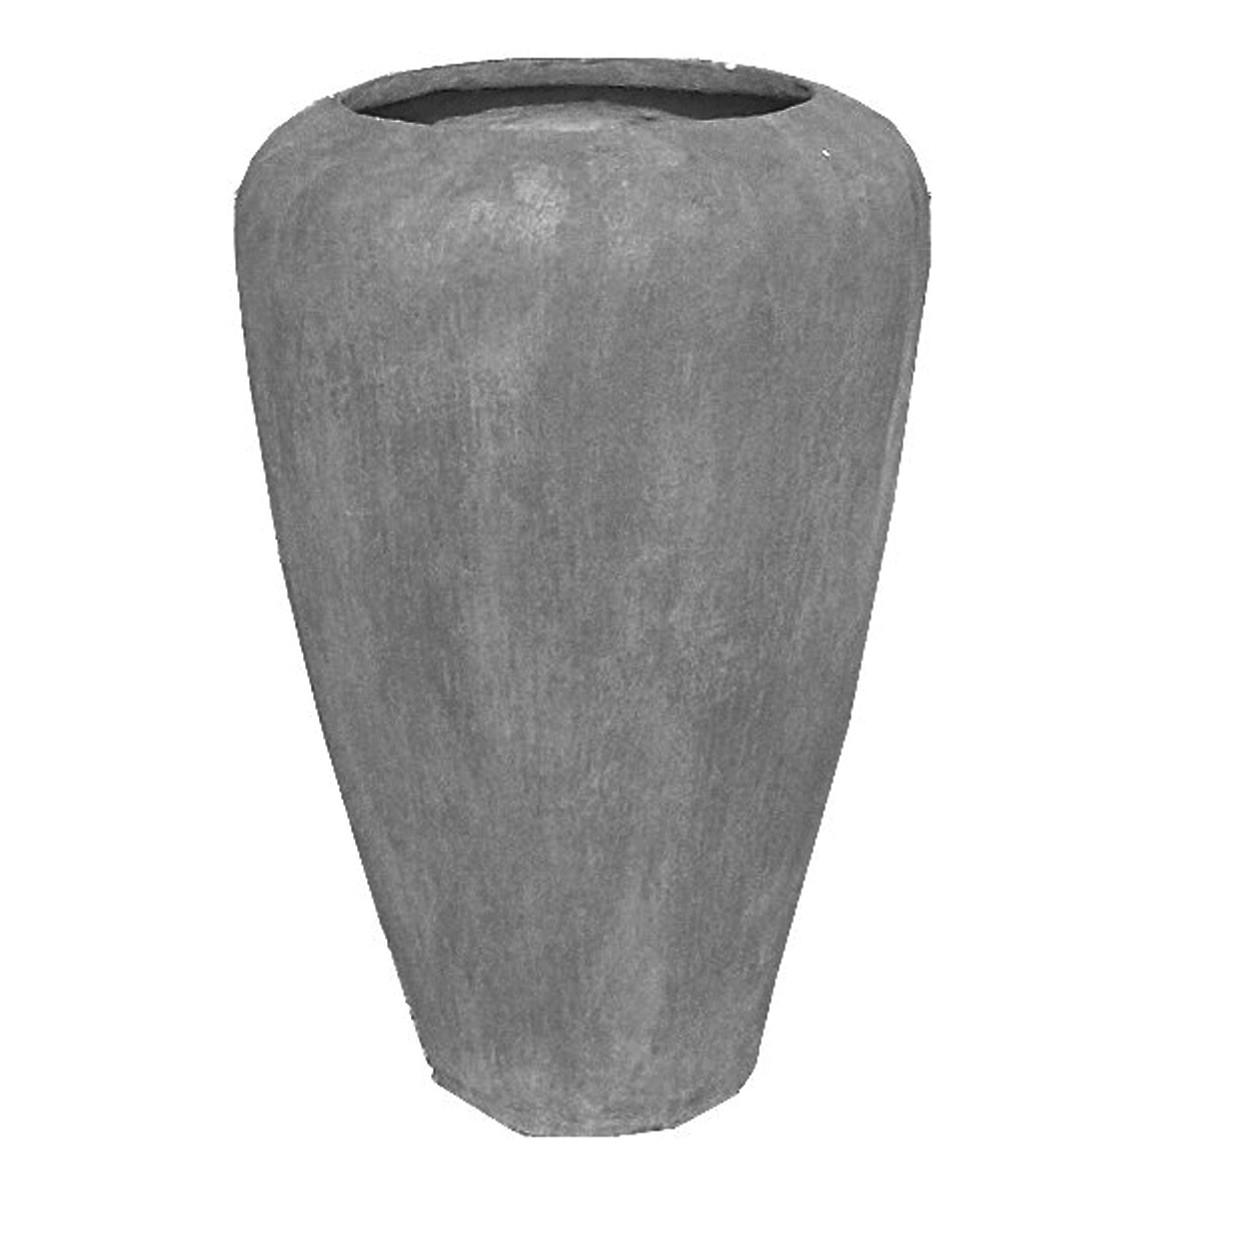 Ansie Vase Classic Large Whitewash Finish - H630mm - 32kg